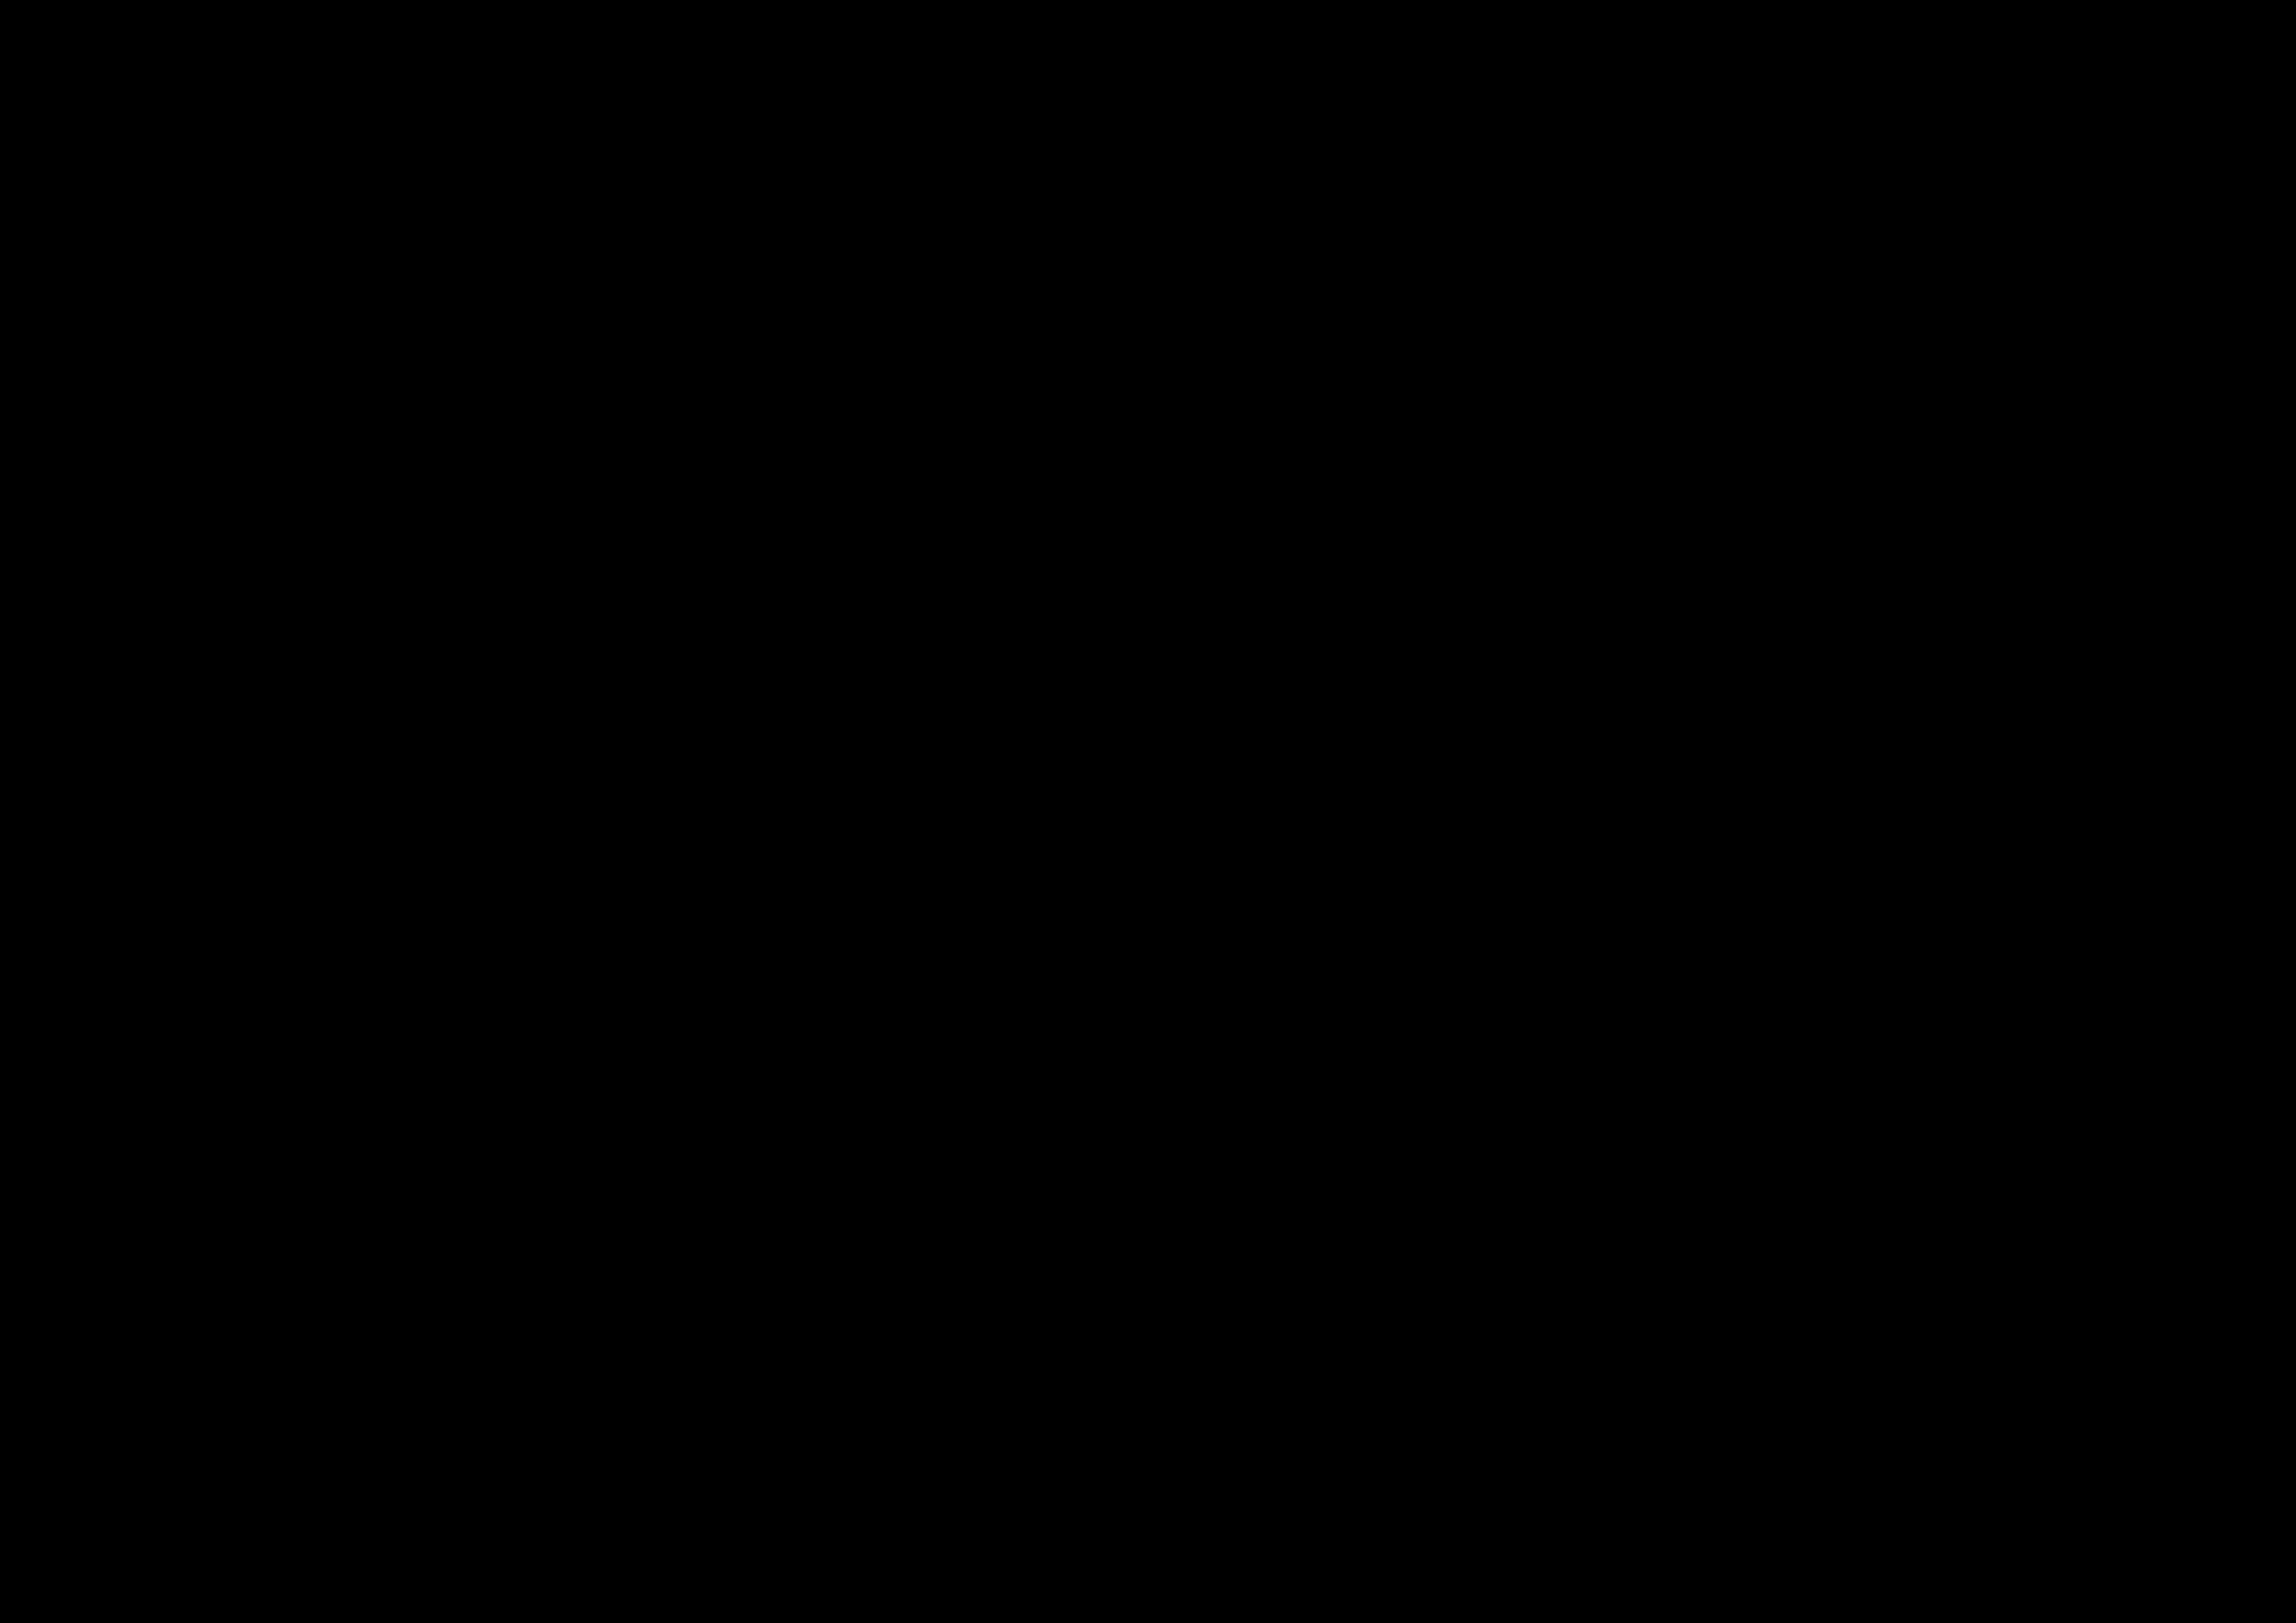 Kimpton_St_Honore_Logotype